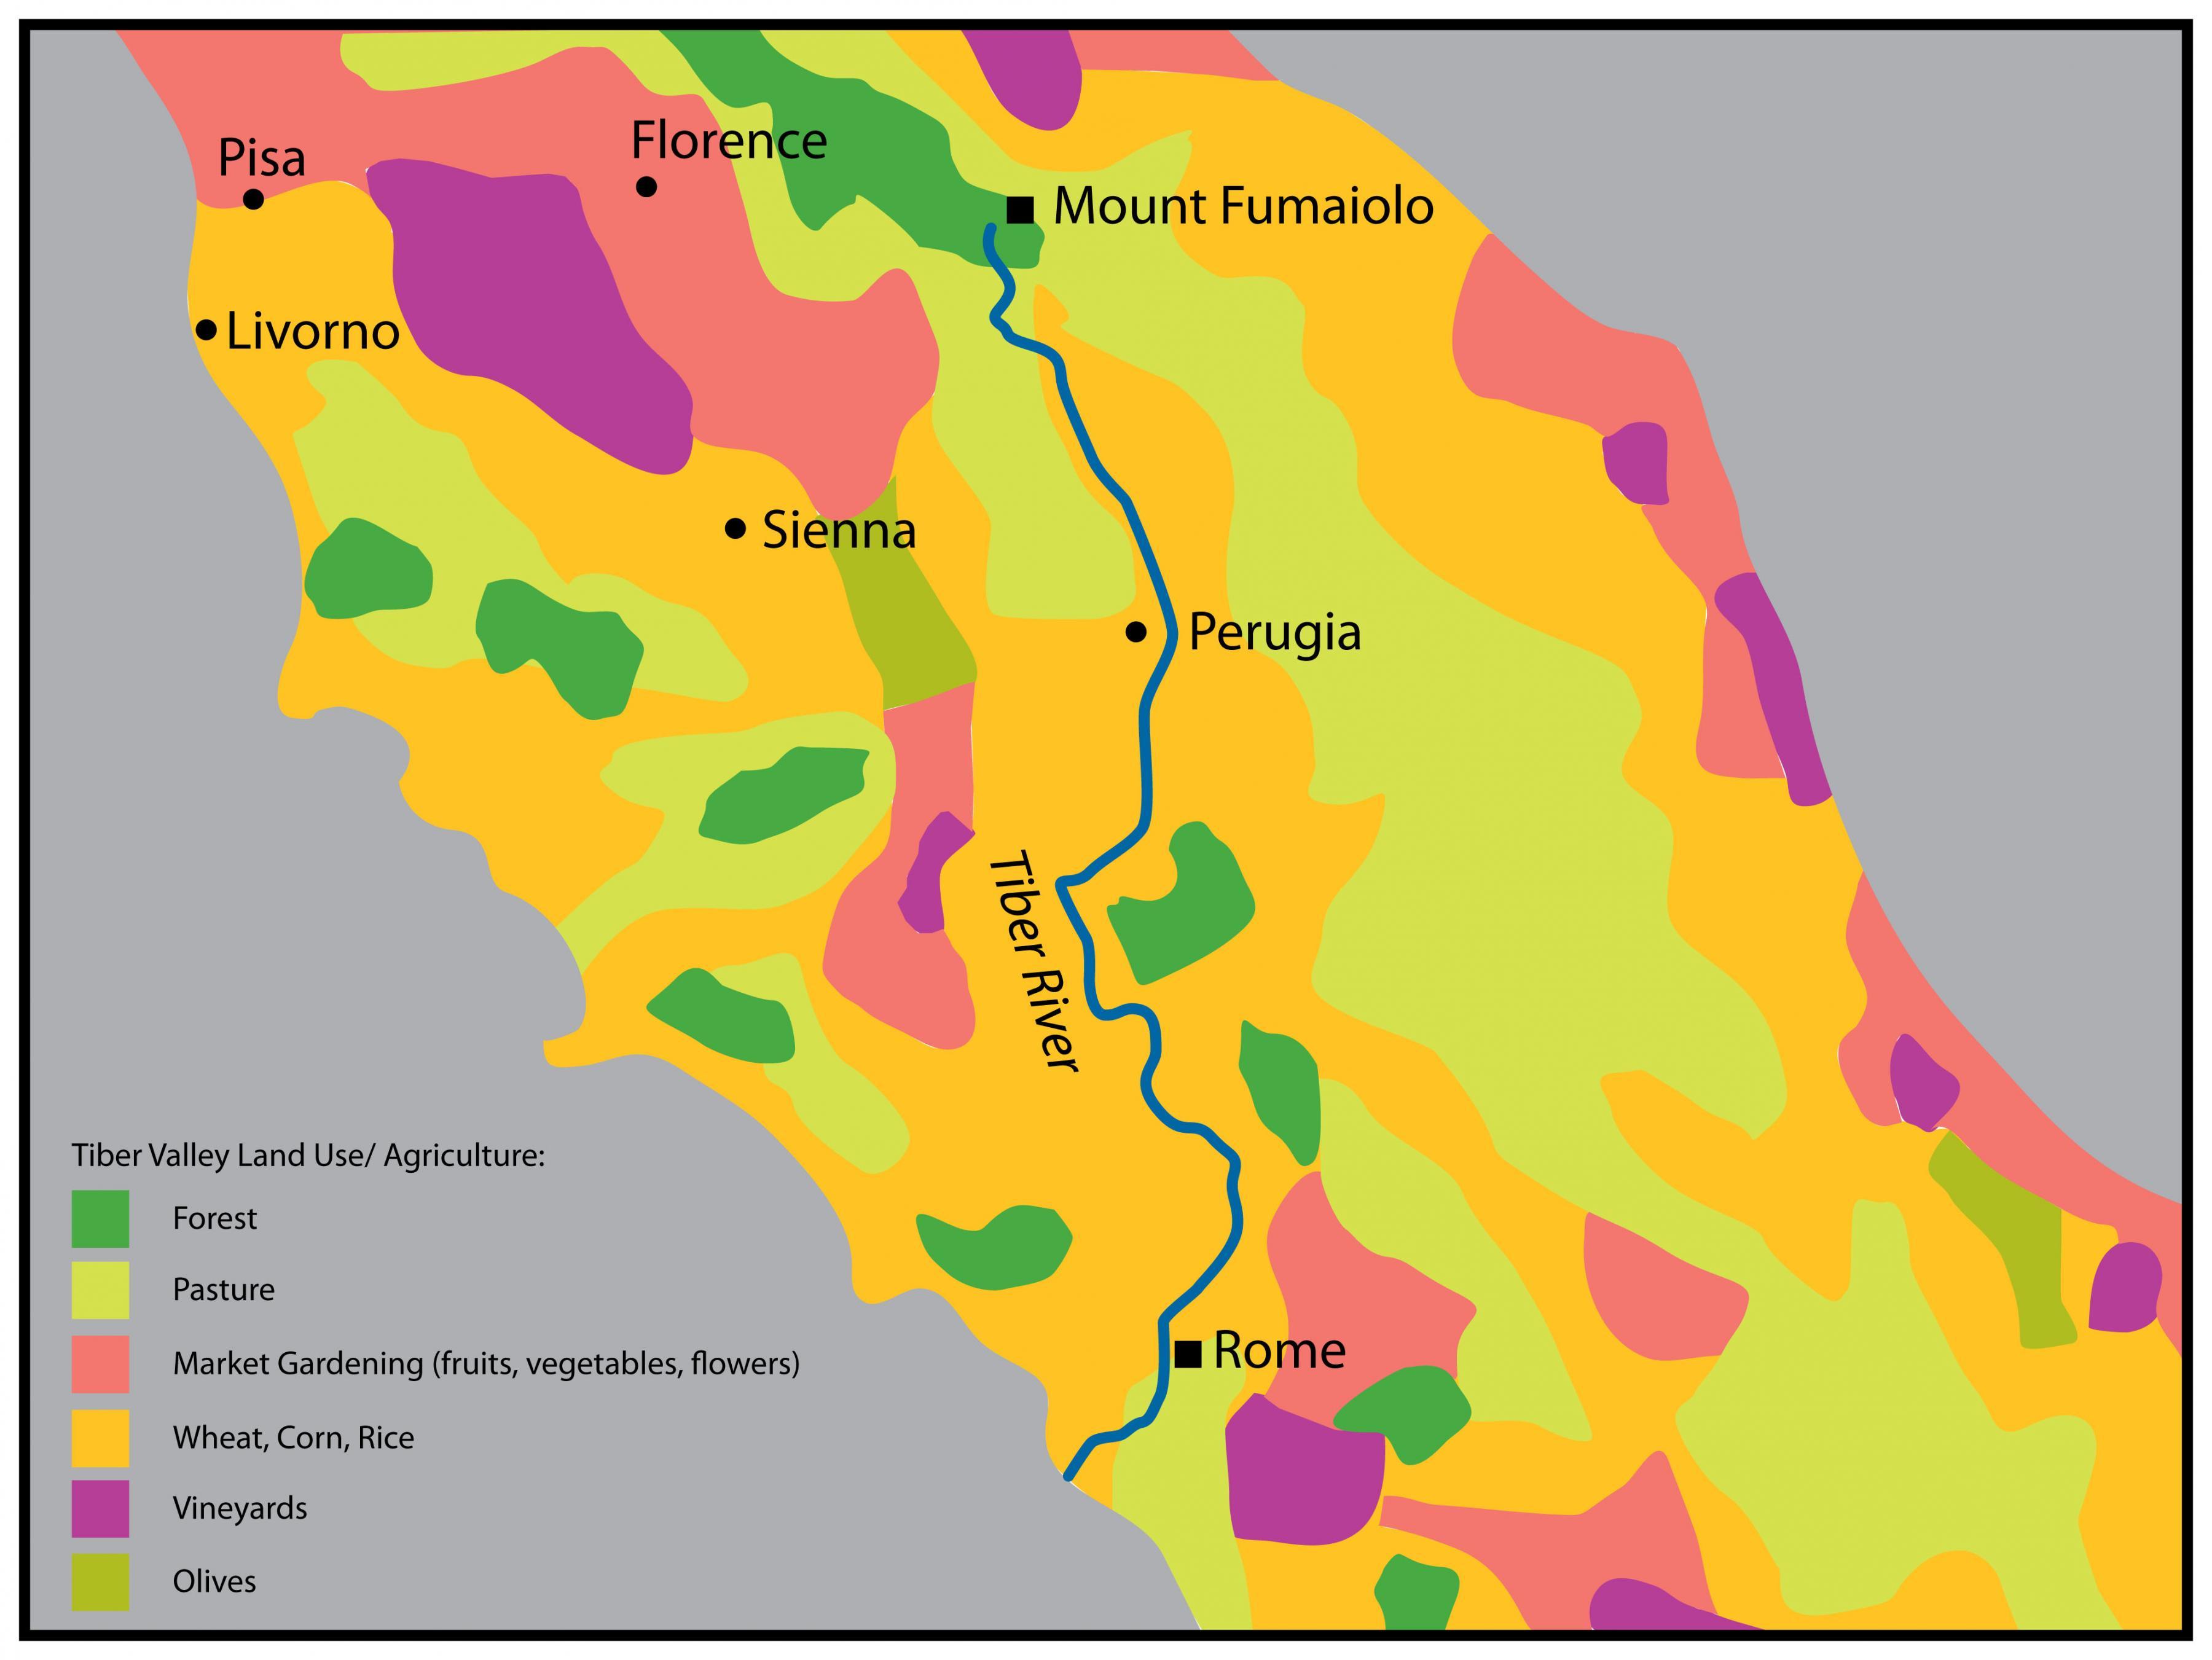 map of tiber river in europe Tiber river map   Tiber river Rome map (Lazio   Italy)